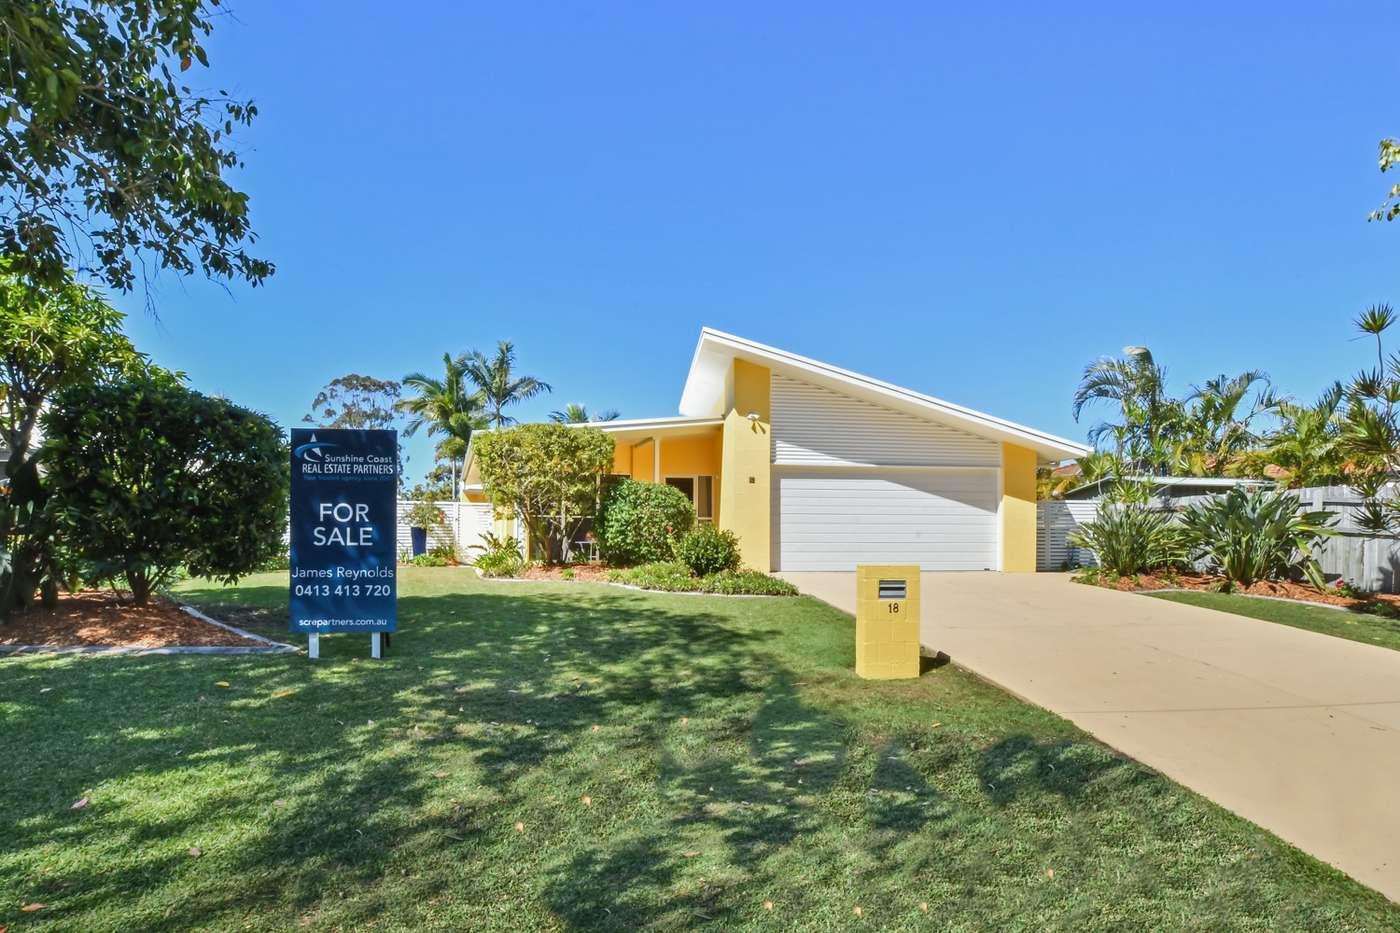 Main view of Homely house listing, 18 Sunjewel Boulevard, Currimundi, QLD 4551